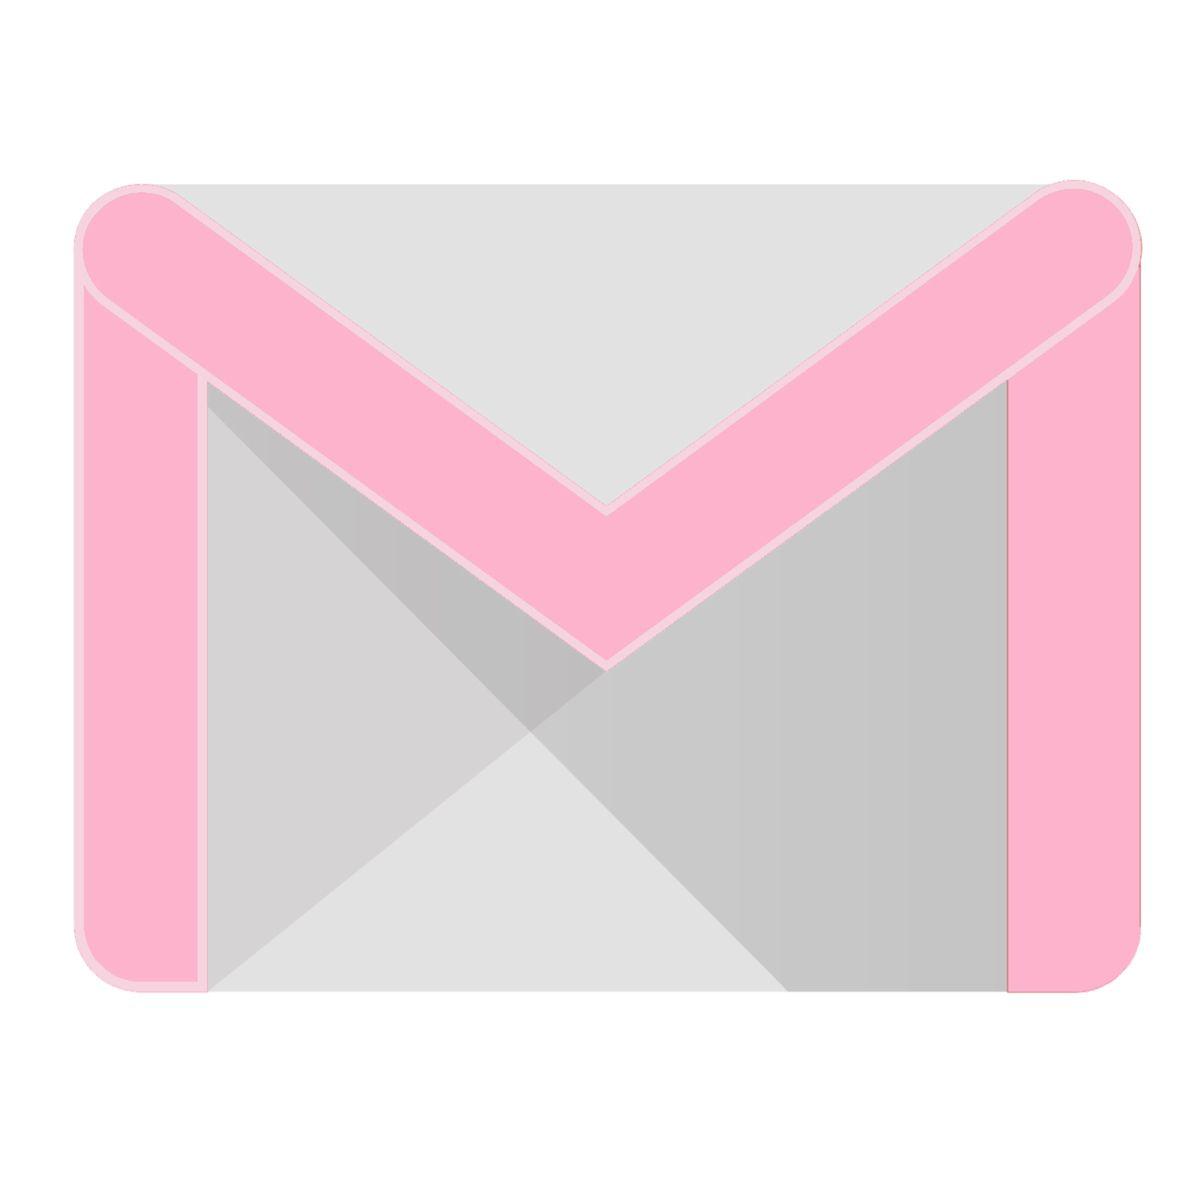 Pink Gmail Icon Iphone App Design Iphone Wallpaper App App Icon